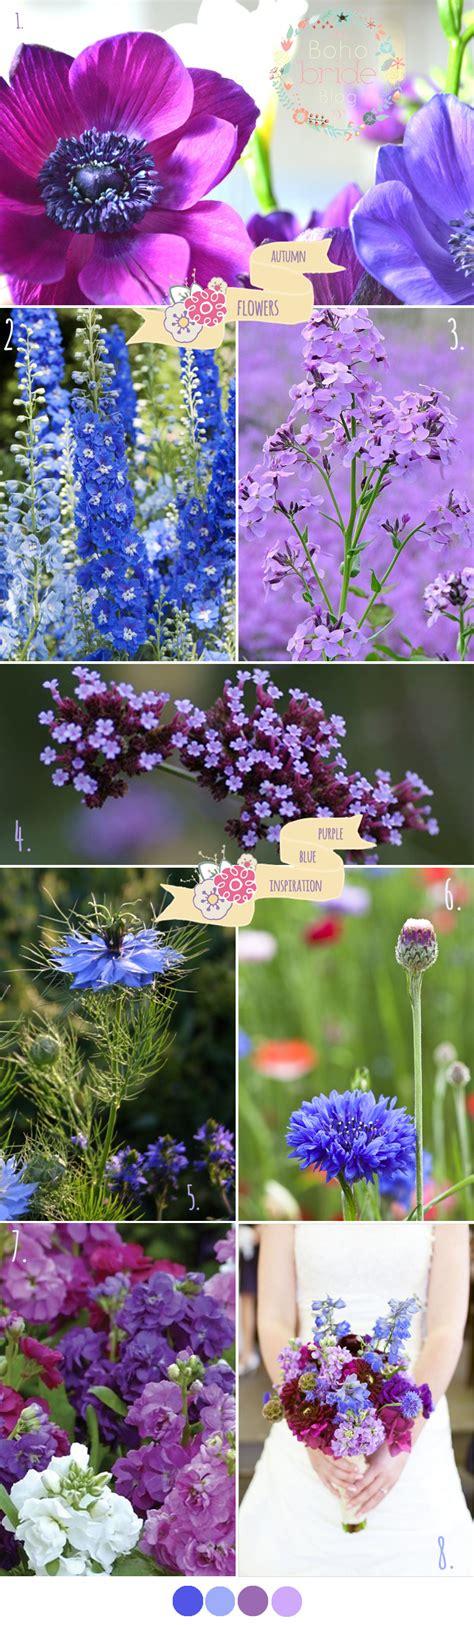 corn flower blue flower inspiration early autumn wedding flower inspiration boho bride